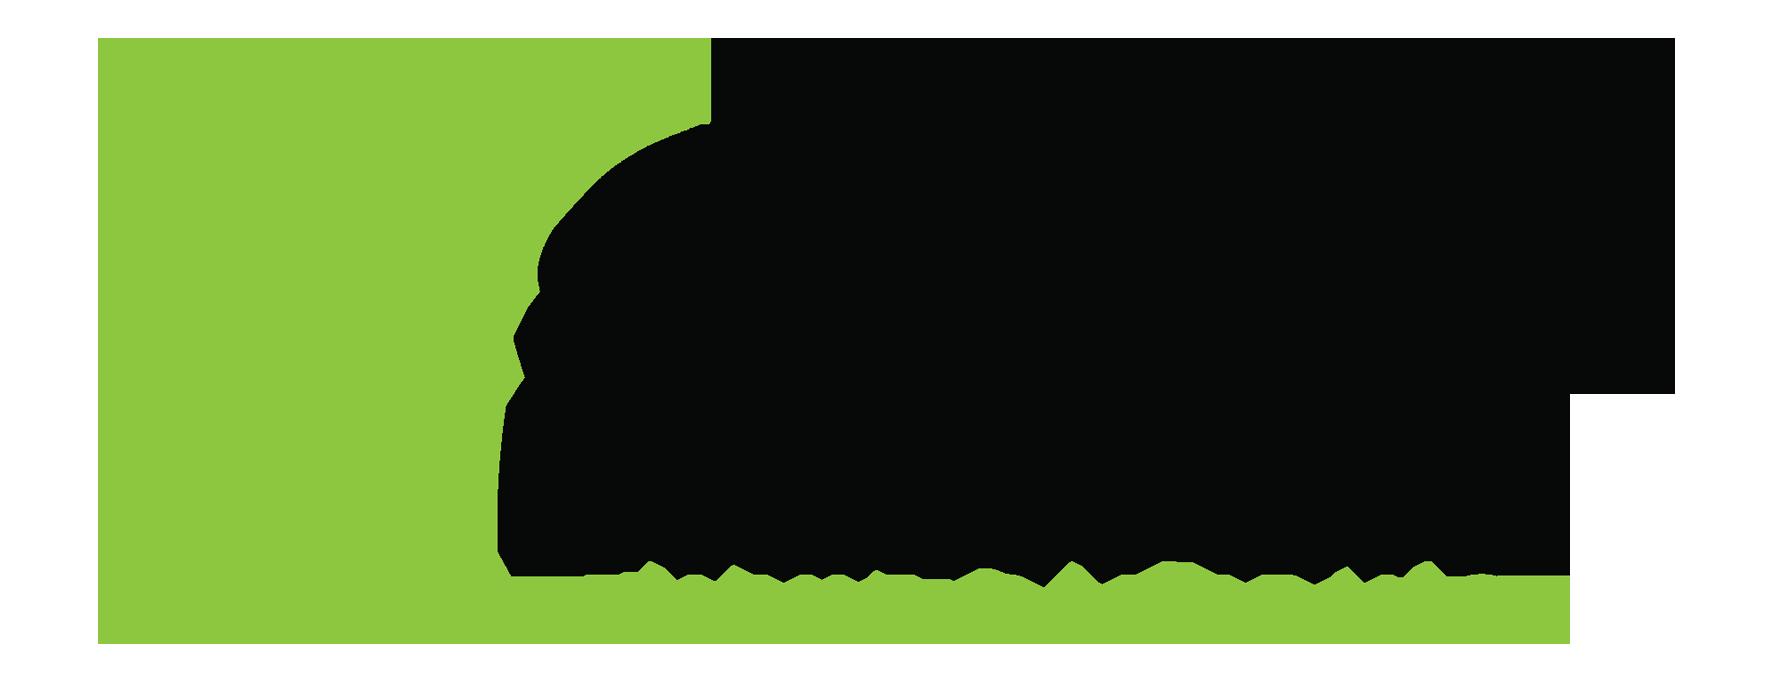 Seventh_Heaven_Logo_black_text_no_bg.png